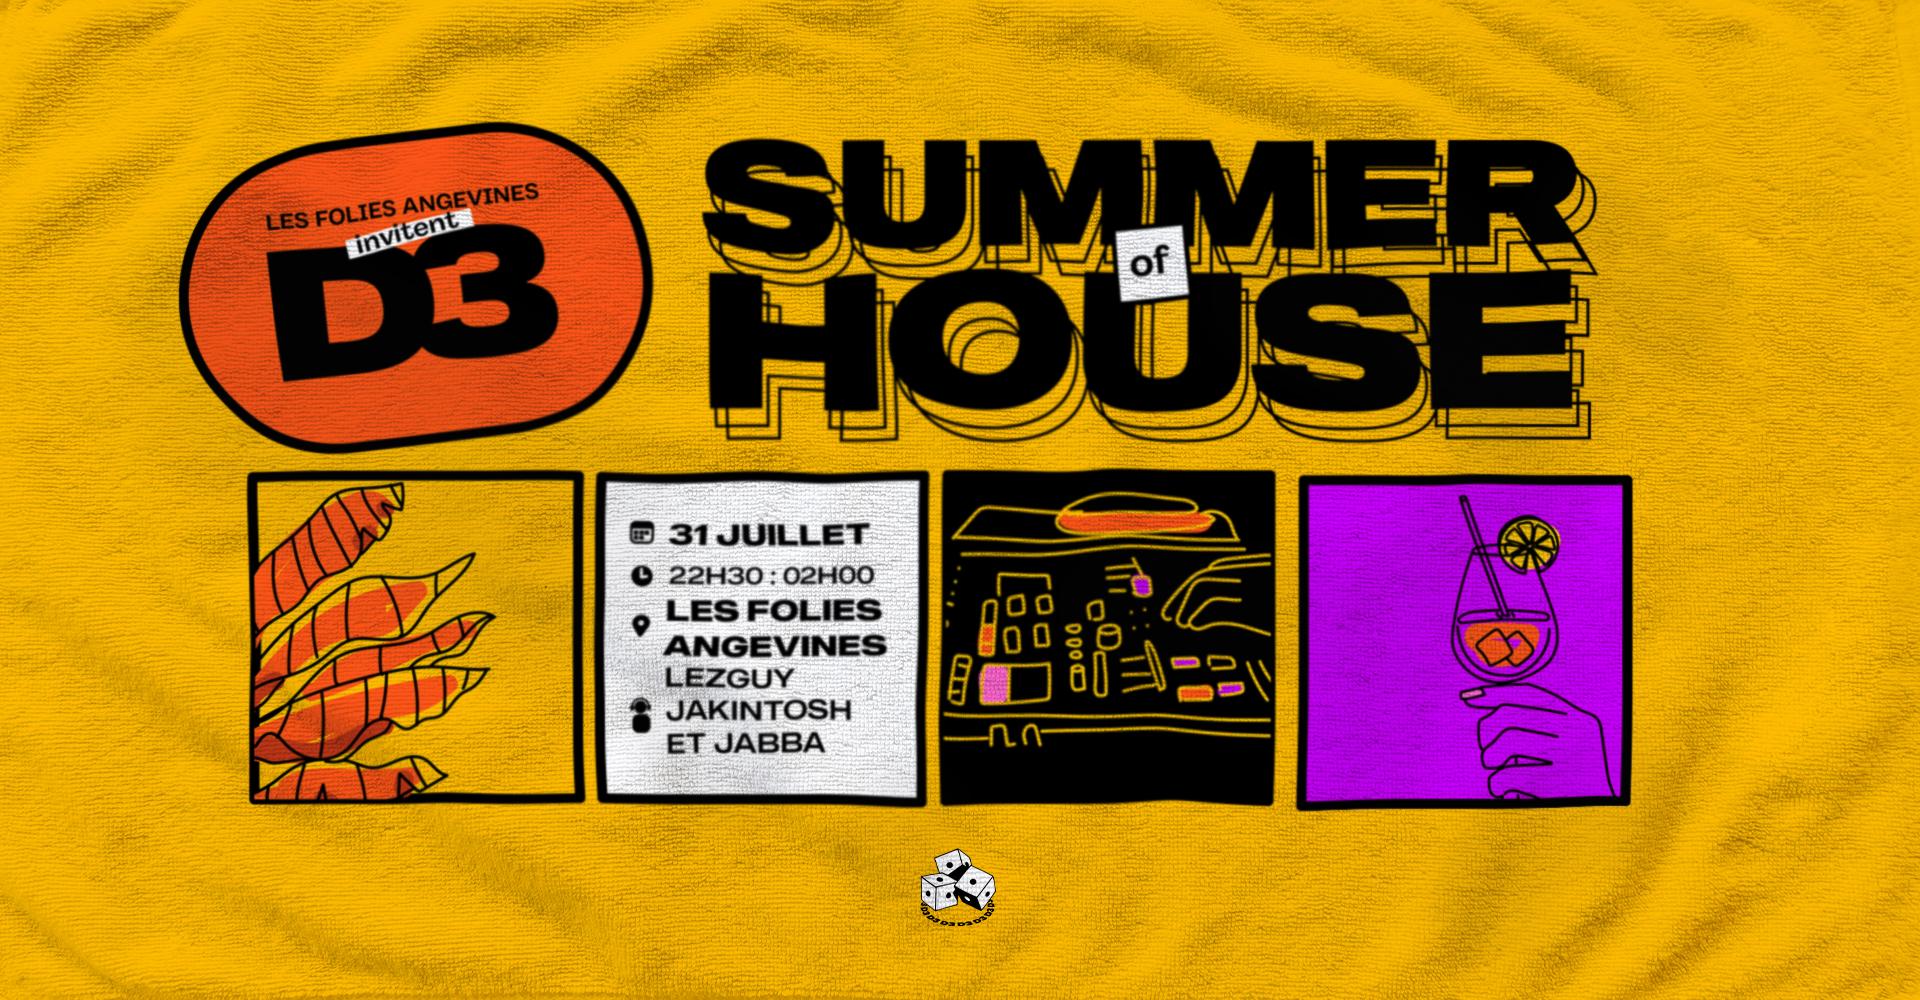 Summer of House : Les Folies invitent D3